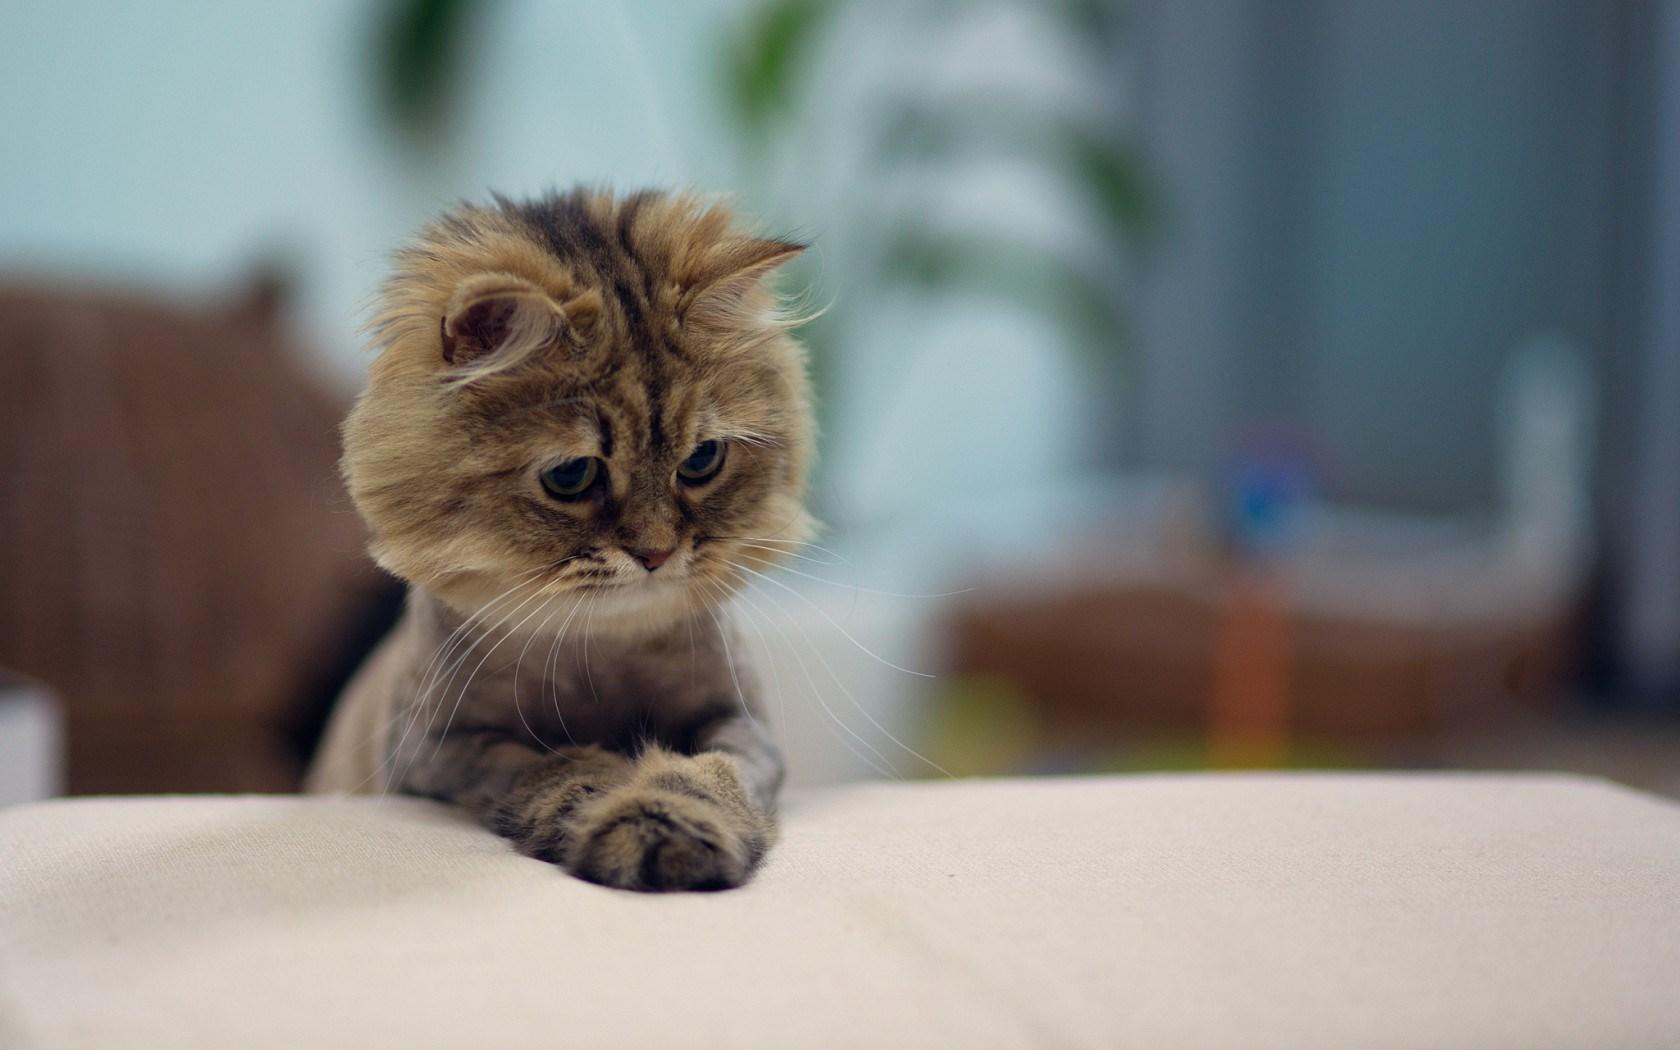 Sweet Cat Close-Up